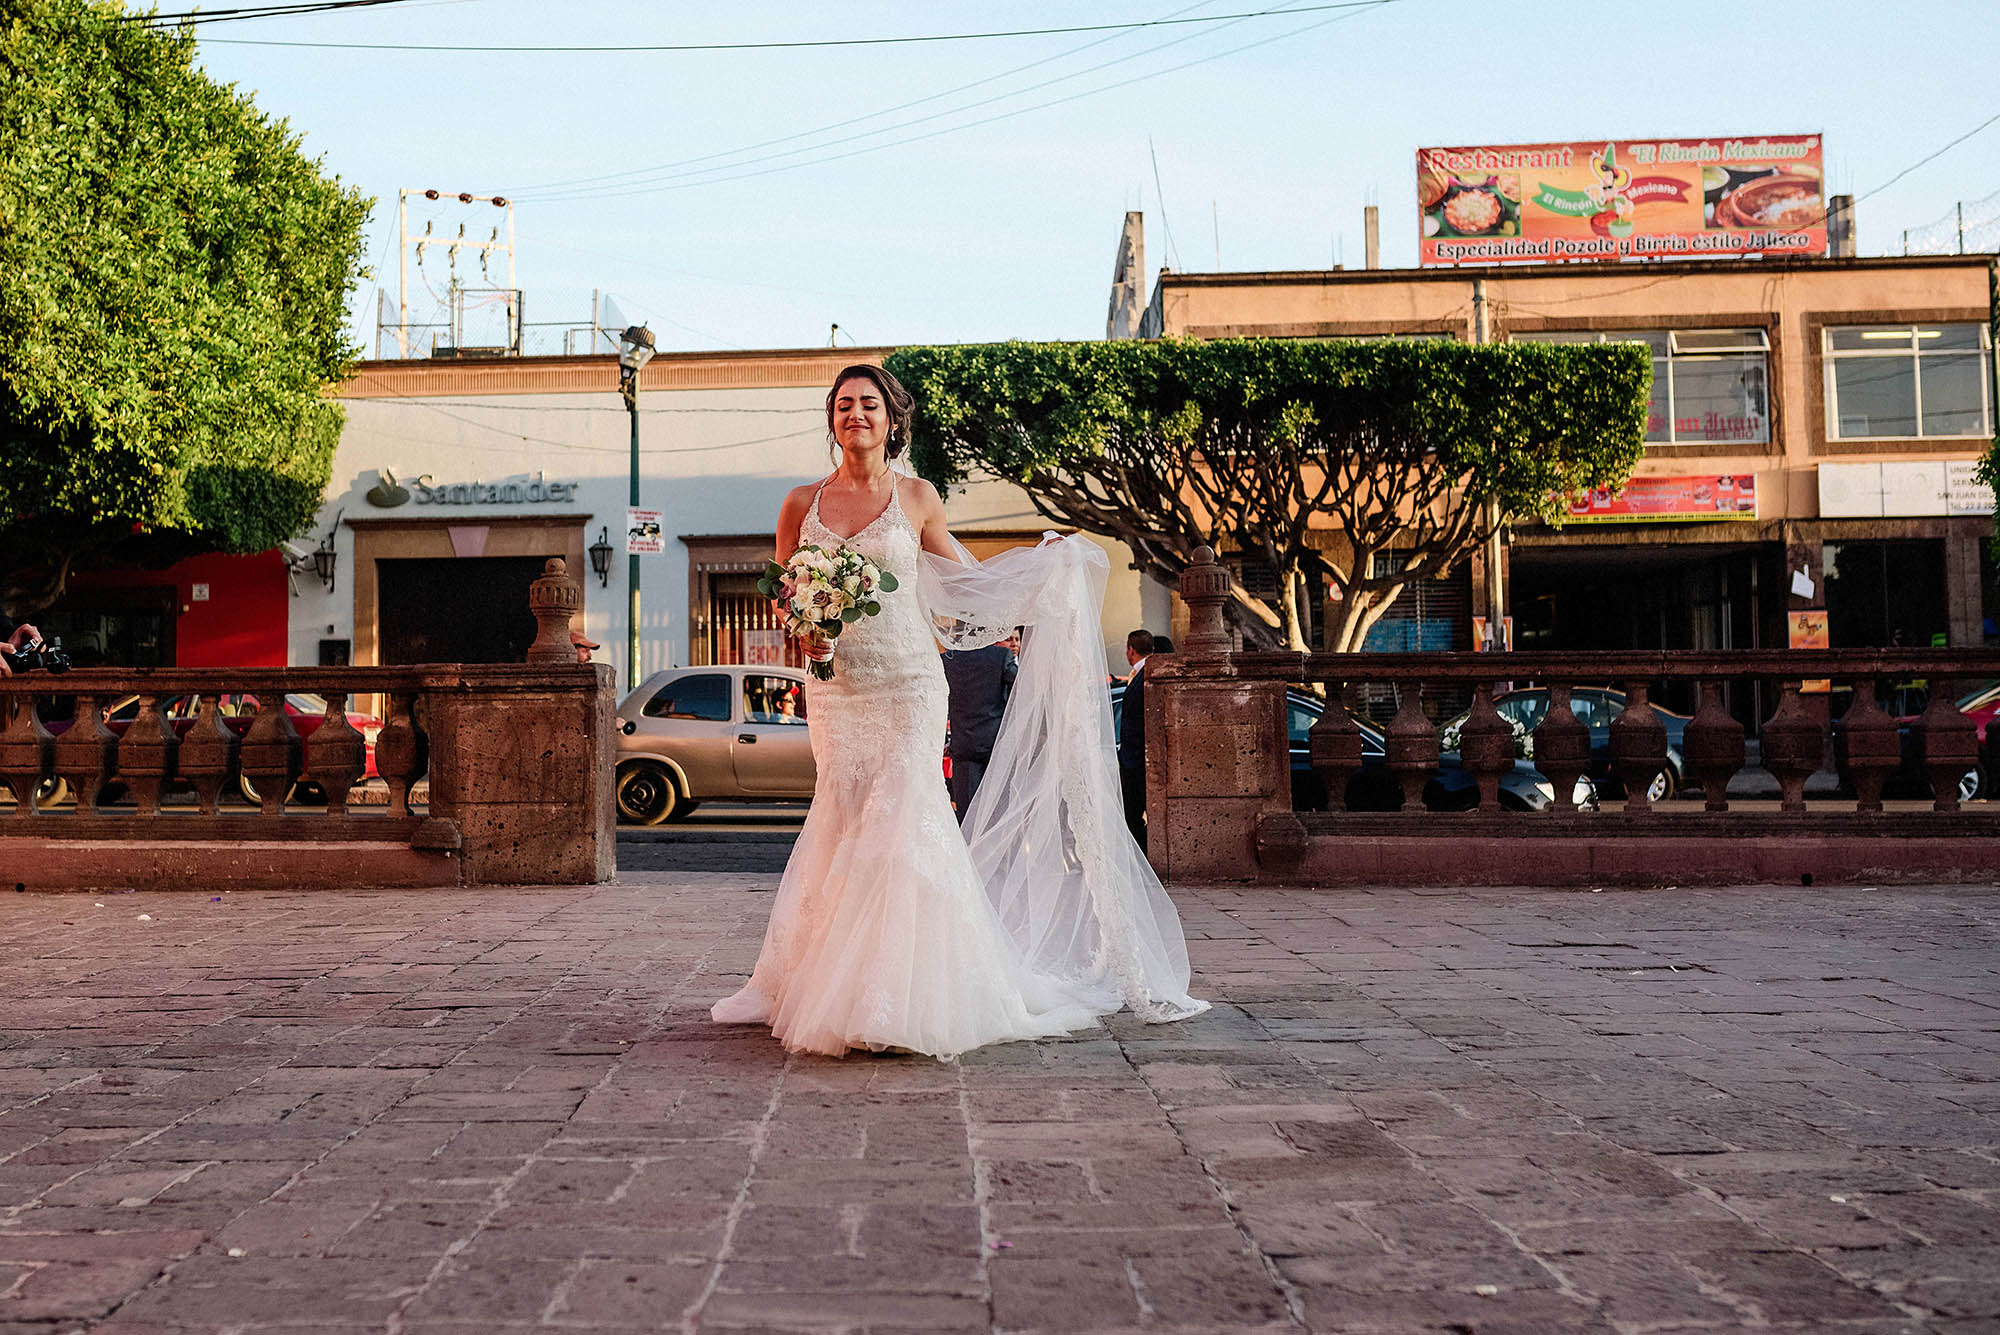 juan_luis_jimenez_fotografo_destino_bodas_queretaro_mexico_4.jpg